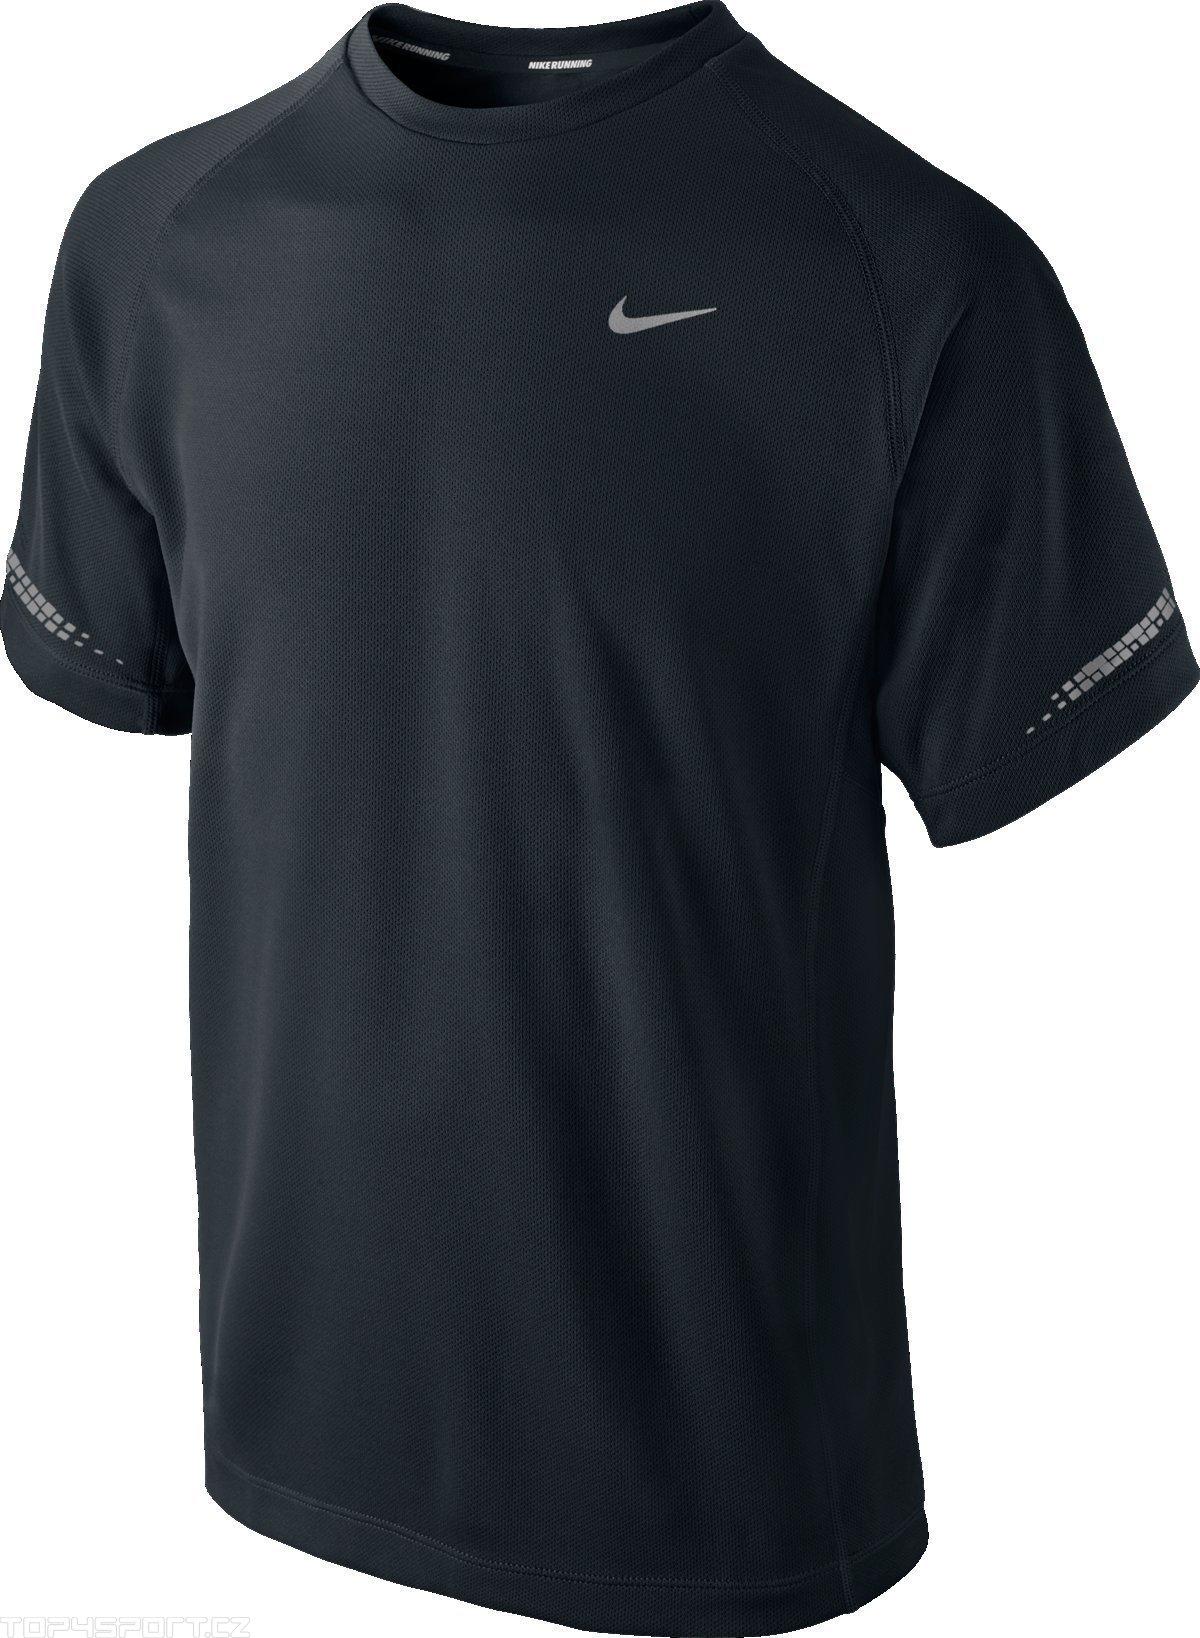 Nike Miler SS Crew Nera Bambino